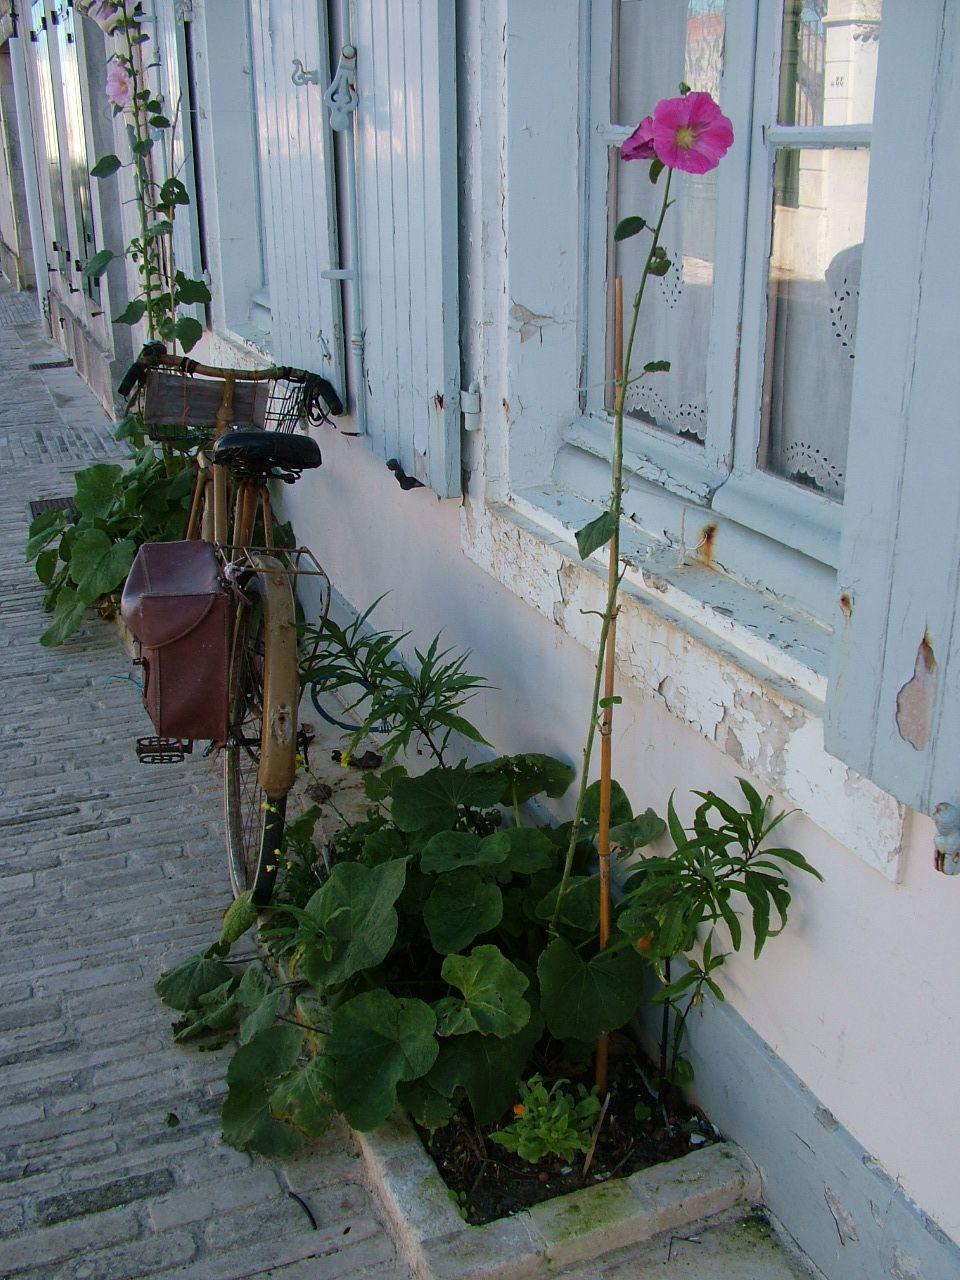 bicyclette et rose tr mi re ars en r ile de re pinterest bicyclettes et roses. Black Bedroom Furniture Sets. Home Design Ideas